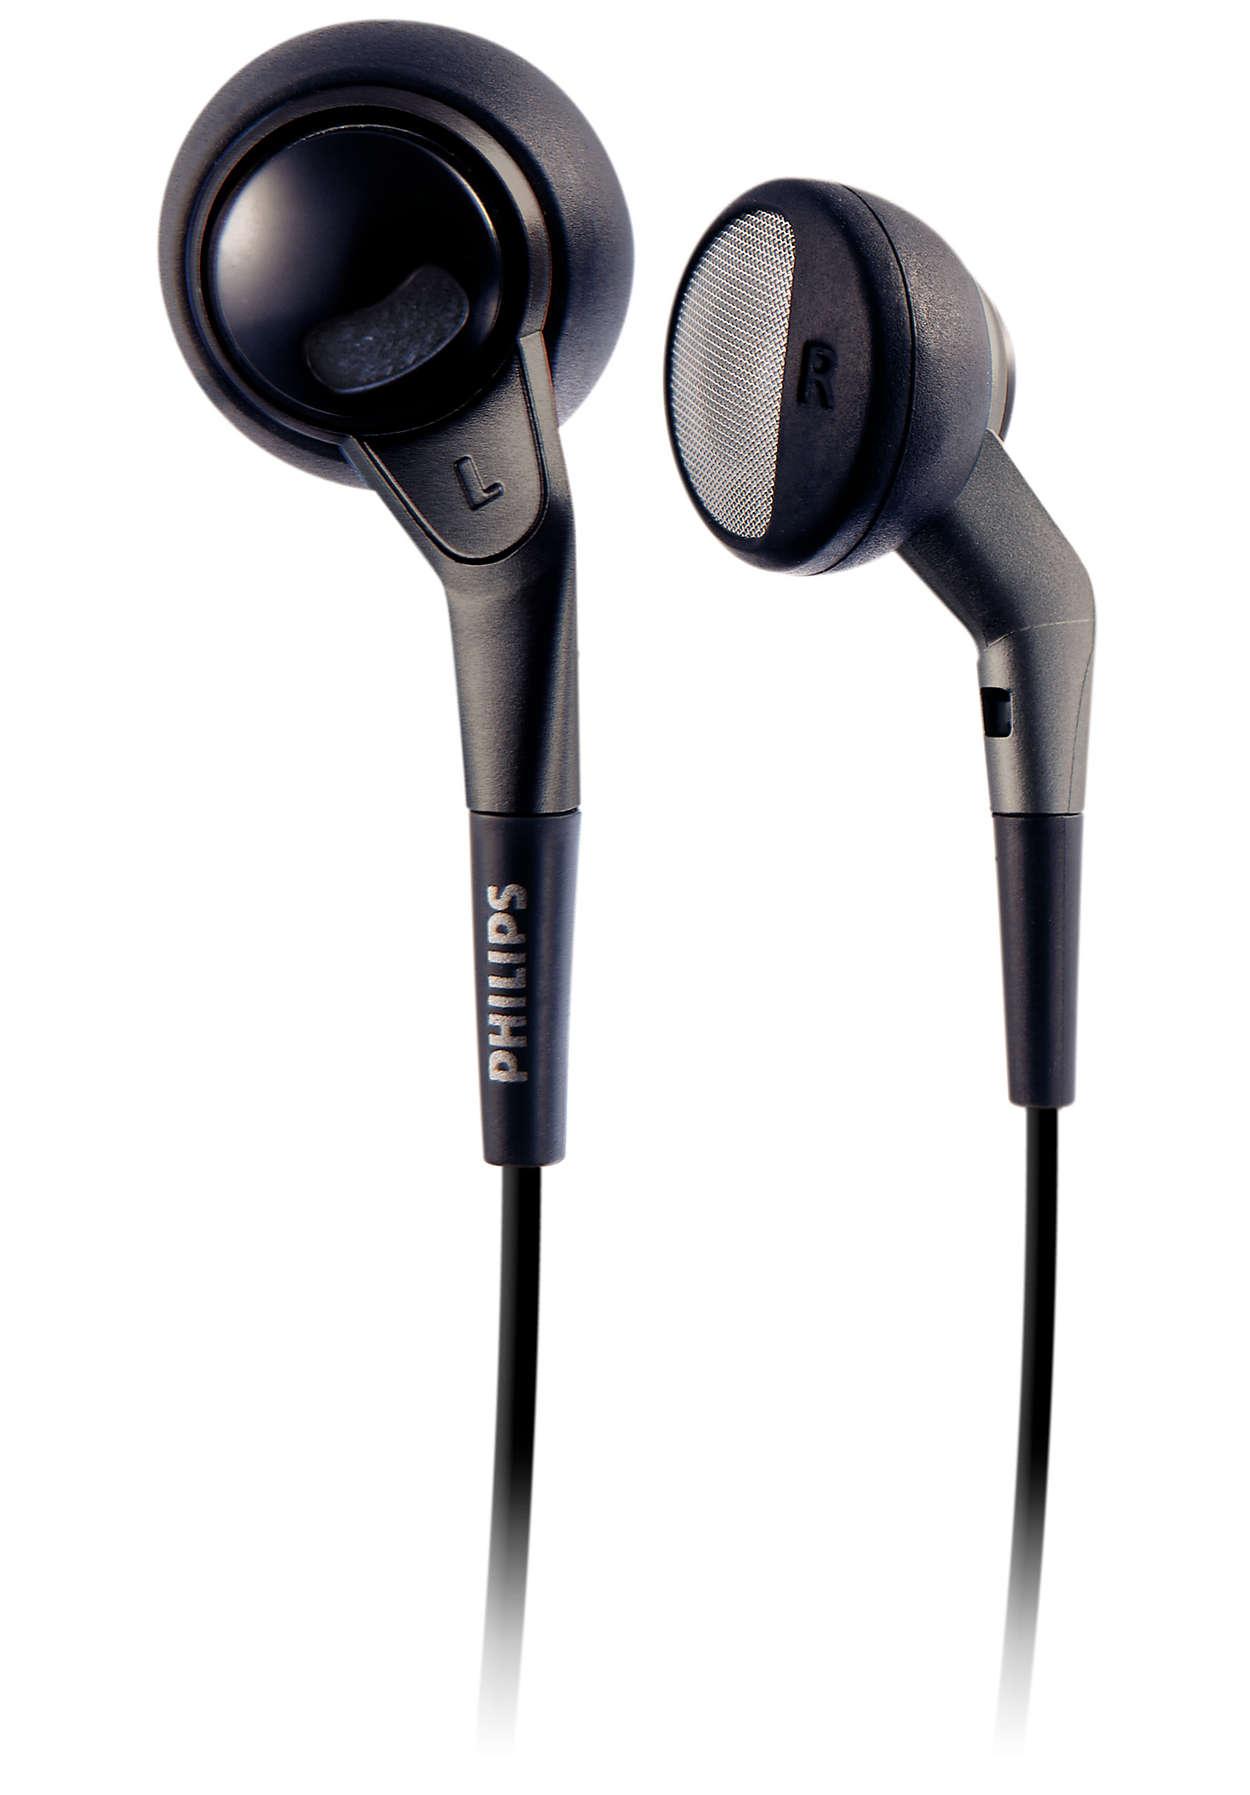 In-Ear Headphones SHE2550/10 | Philips